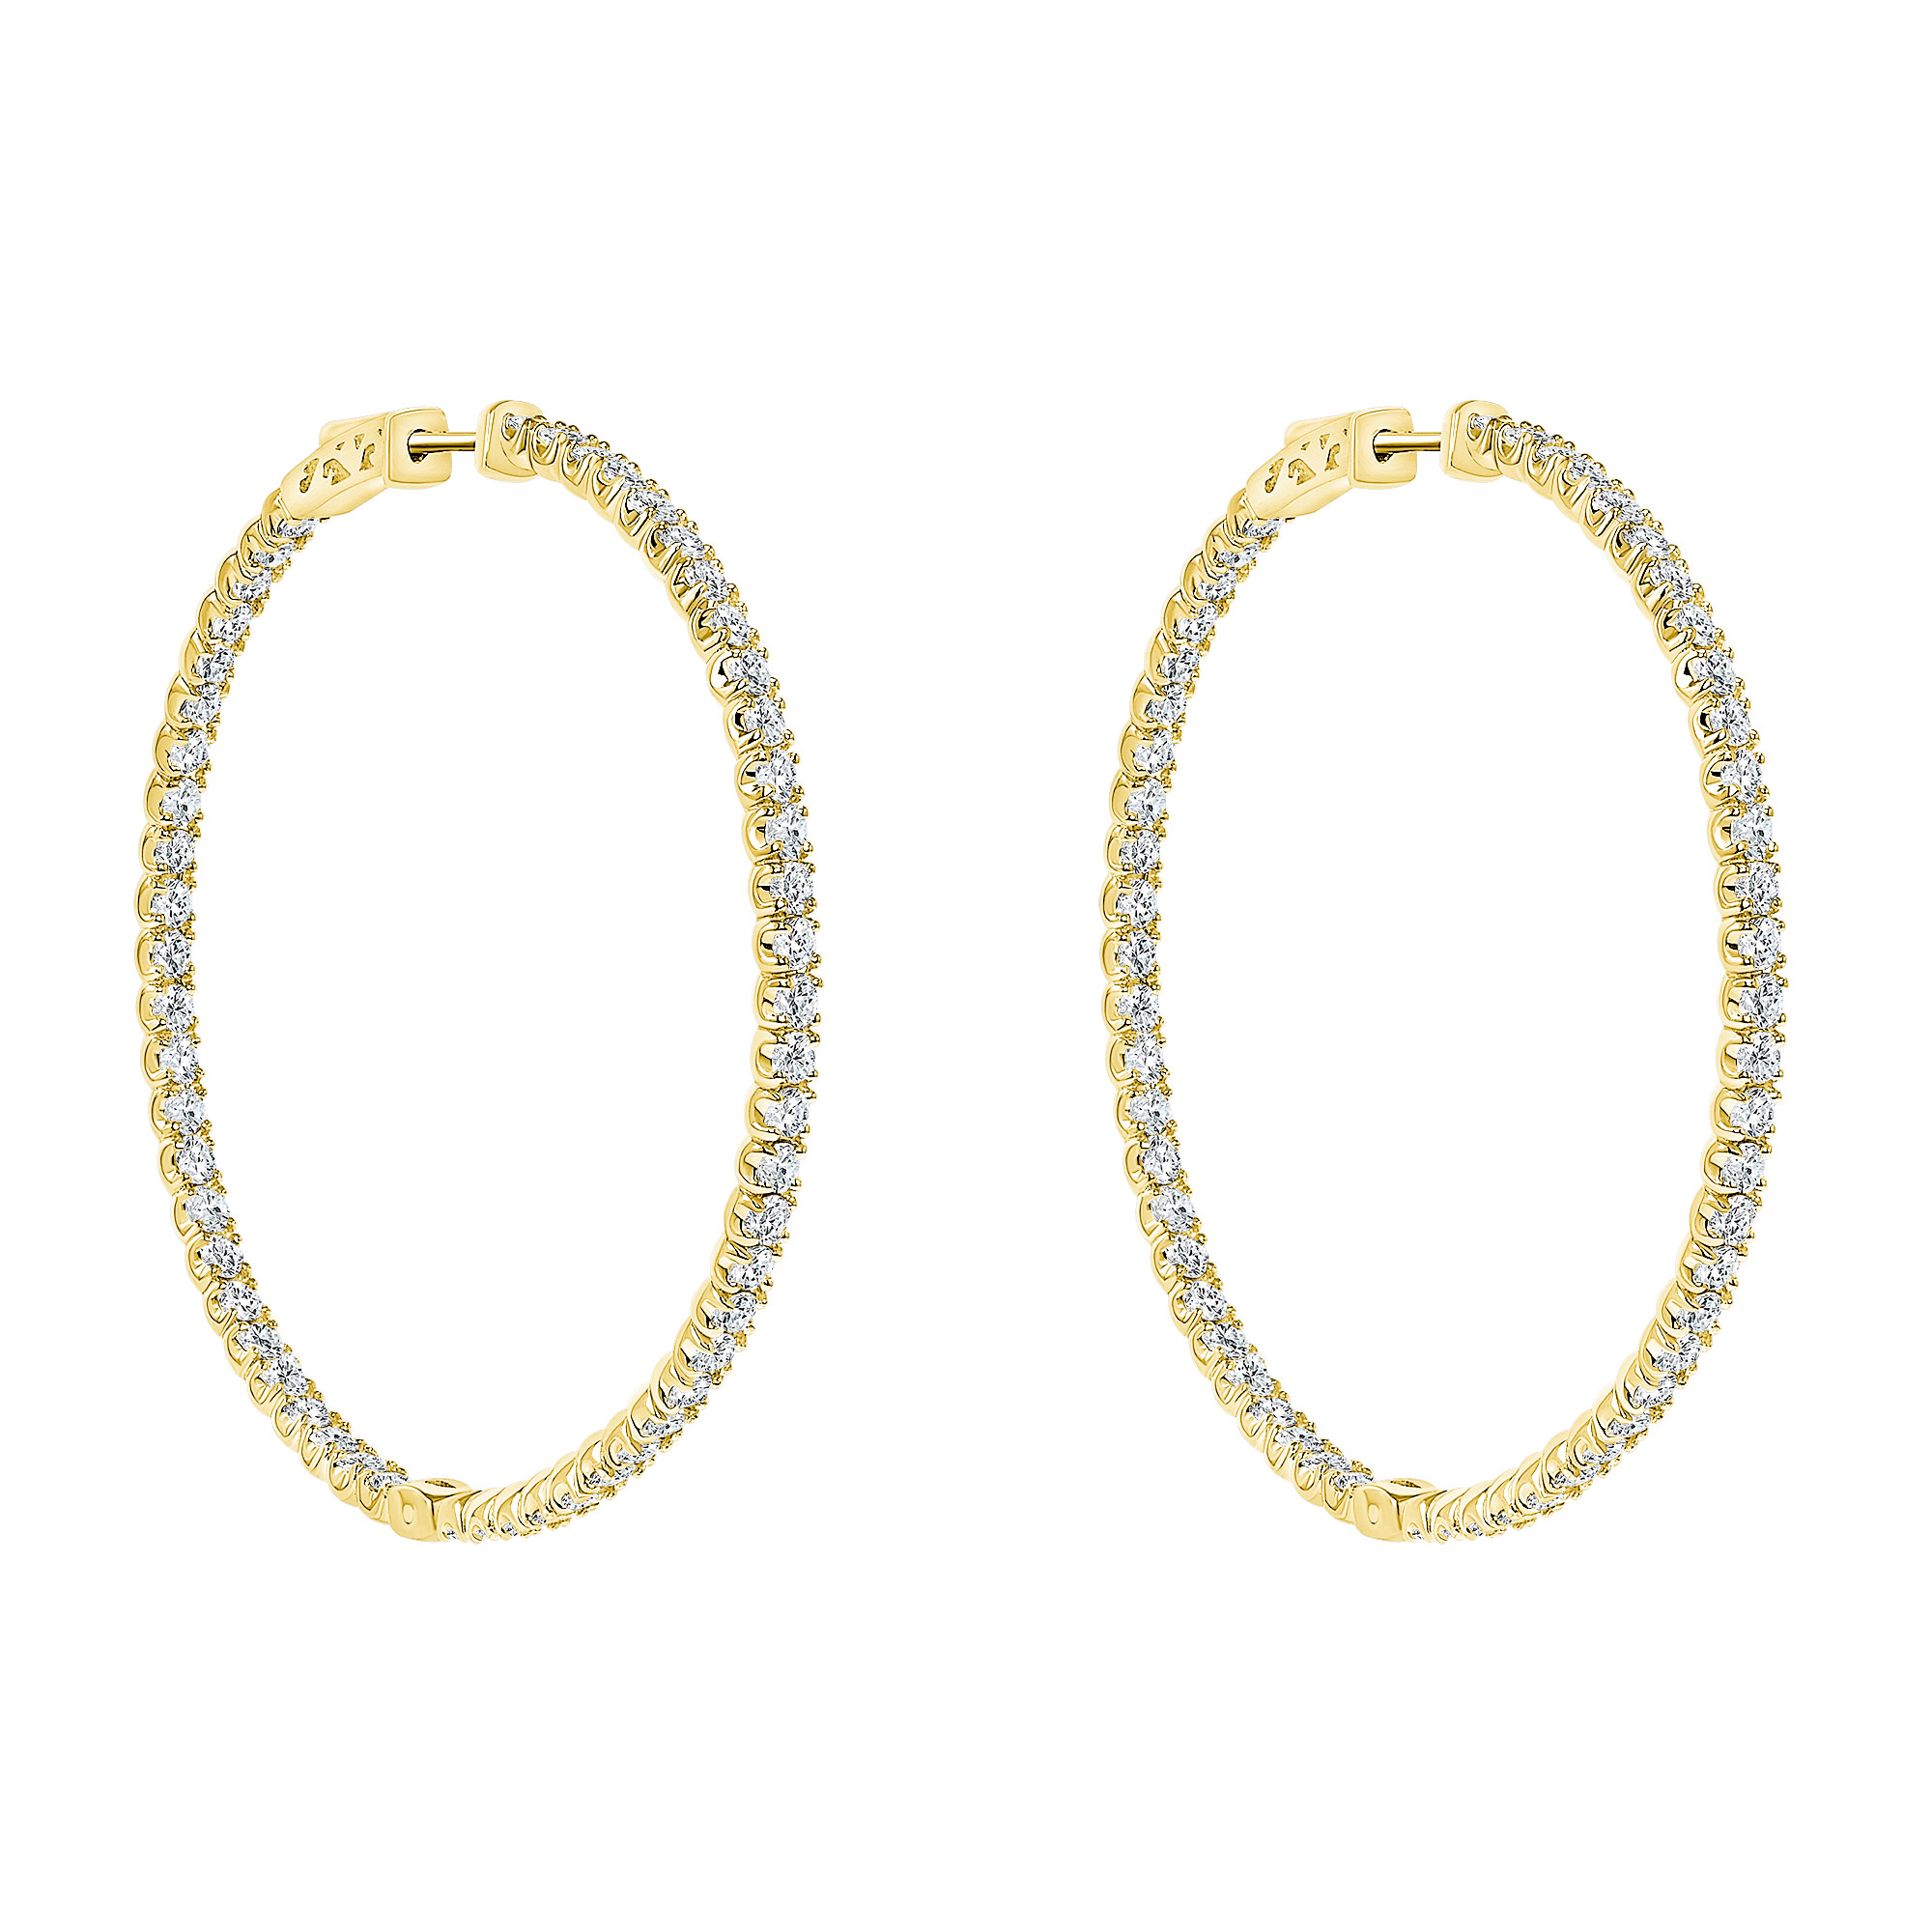 rose gold diamond hoop earrings | small diamond hoops earrings | diamond hoop earrings